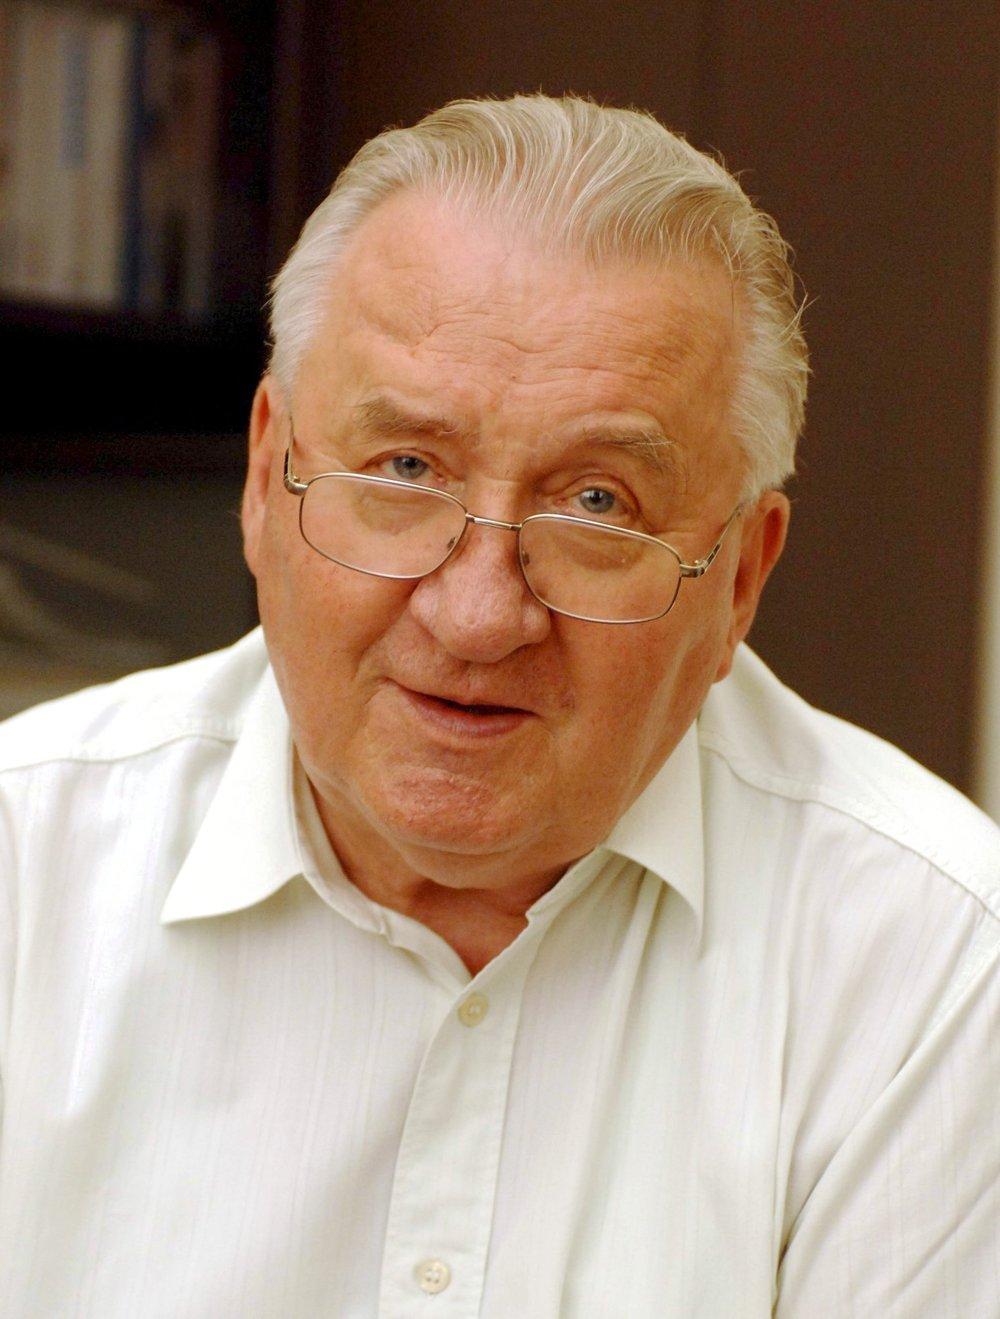 Portrét Michala Kováča z roku 2005.